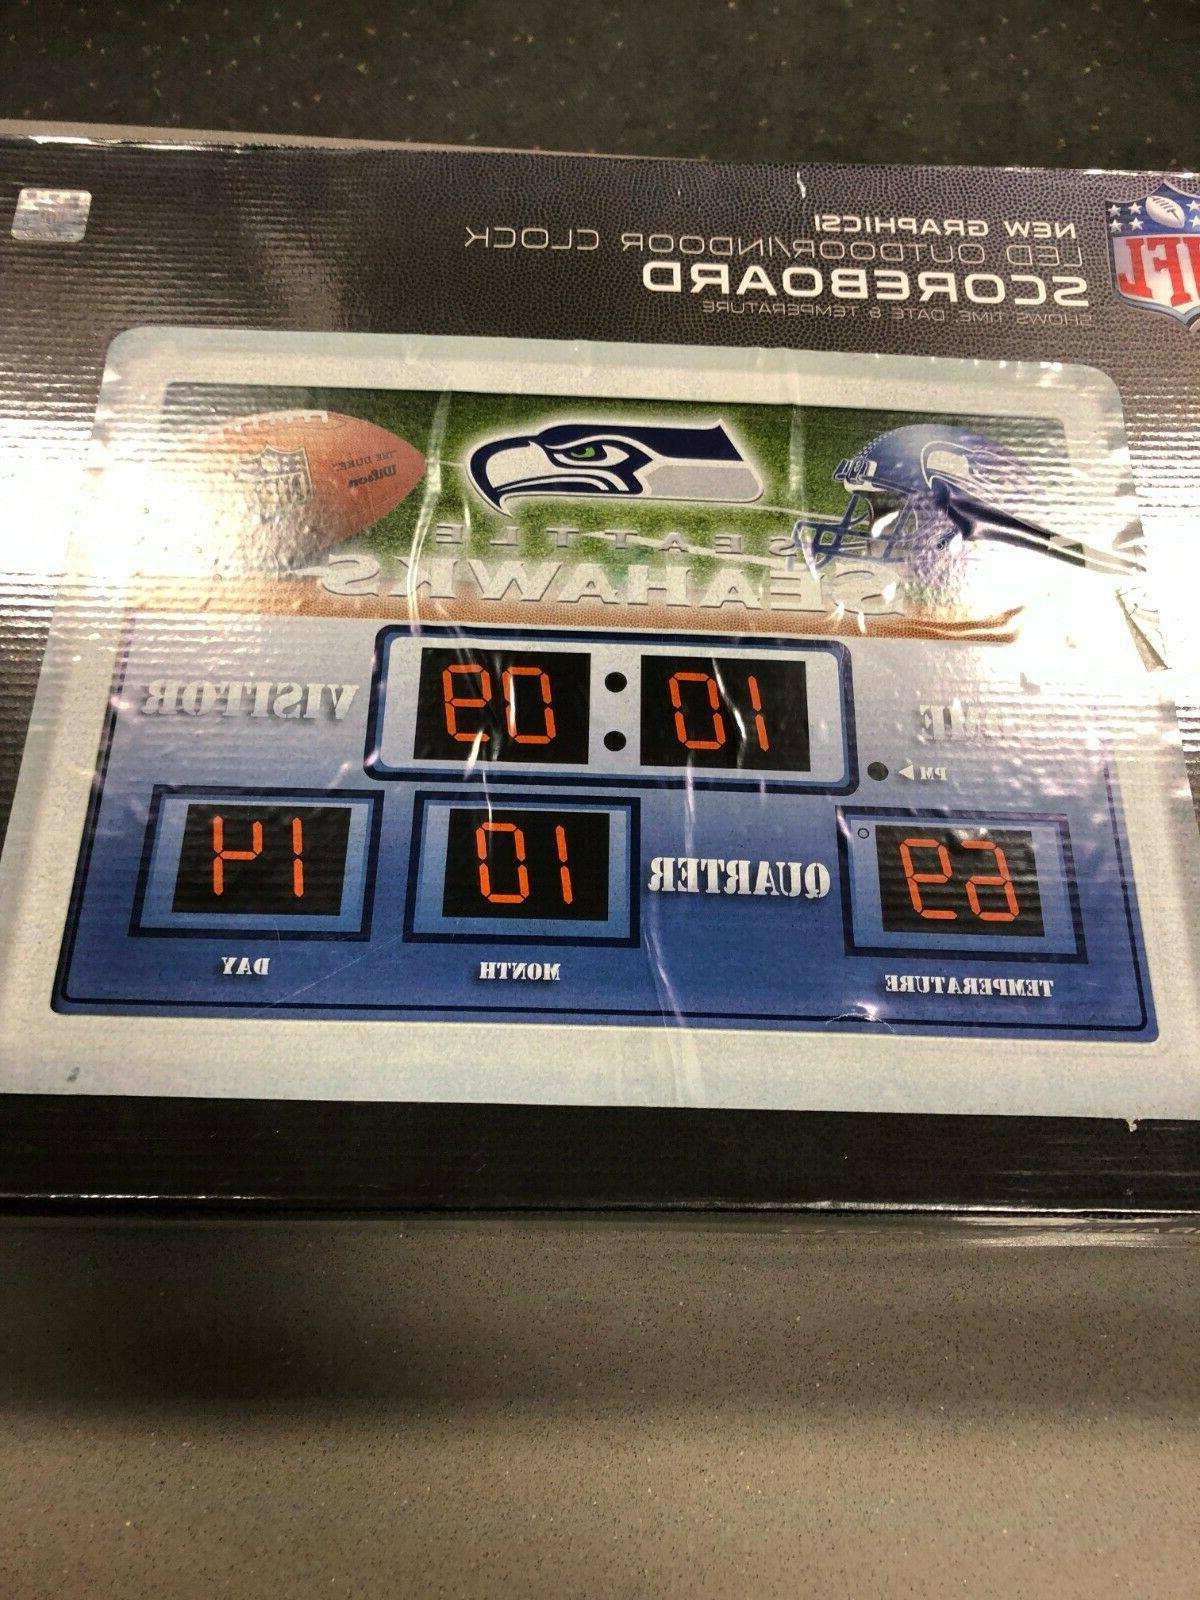 "NFL SEAHAWKS X 14 ""Scoreboard' ALARM CLOCK"